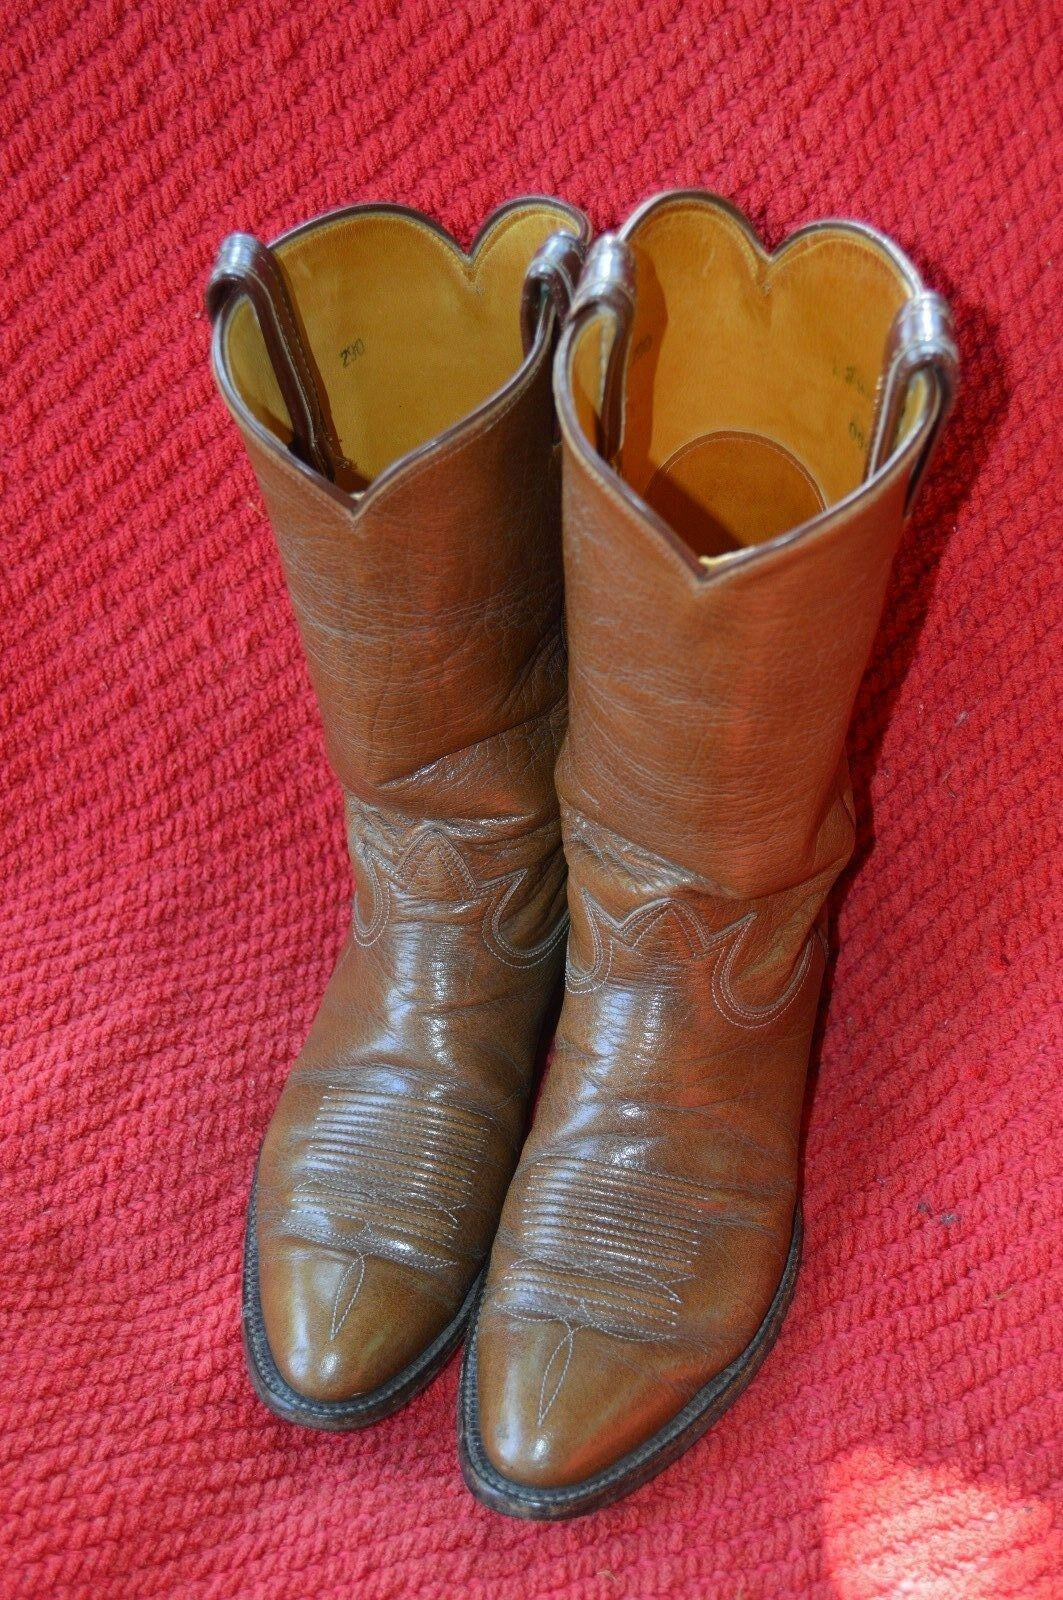 TONY LAMA COWBOY WESTERN BOOTS.  SIZE 8.5, 39 EUROPE, TAN